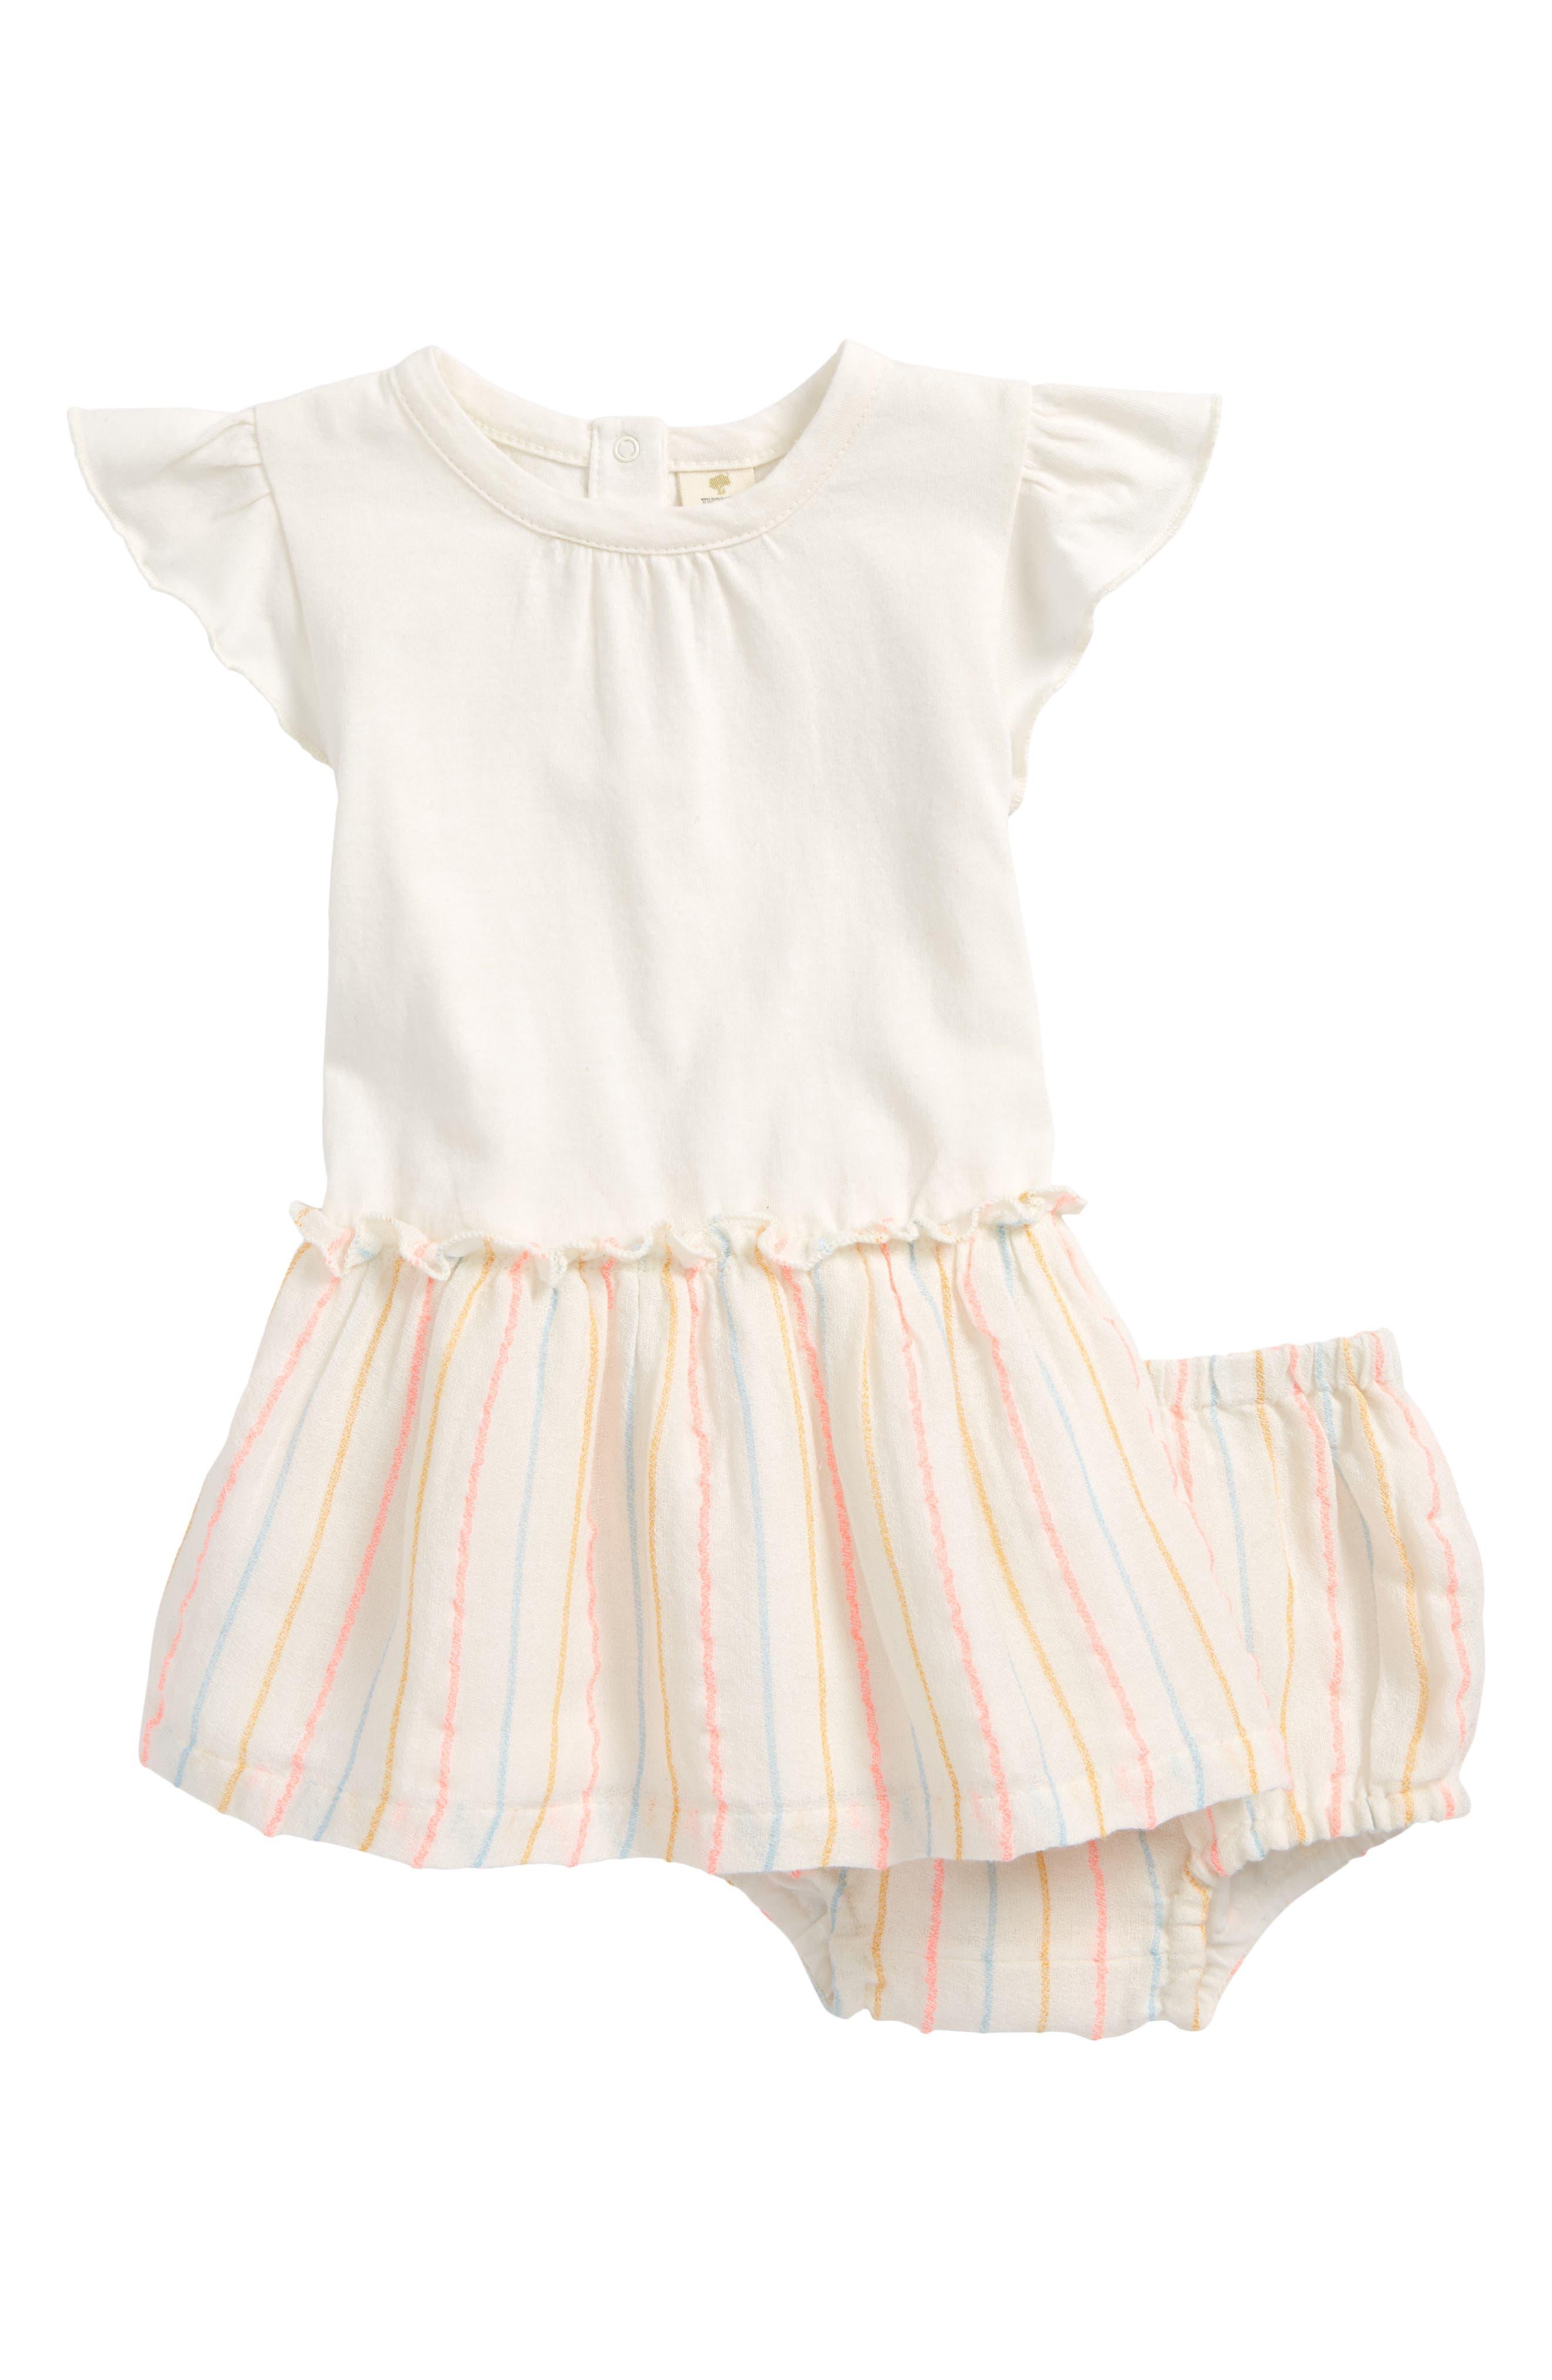 Flutter Sleeve Dress,                         Main,                         color, Ivory Egret Multi Stripe